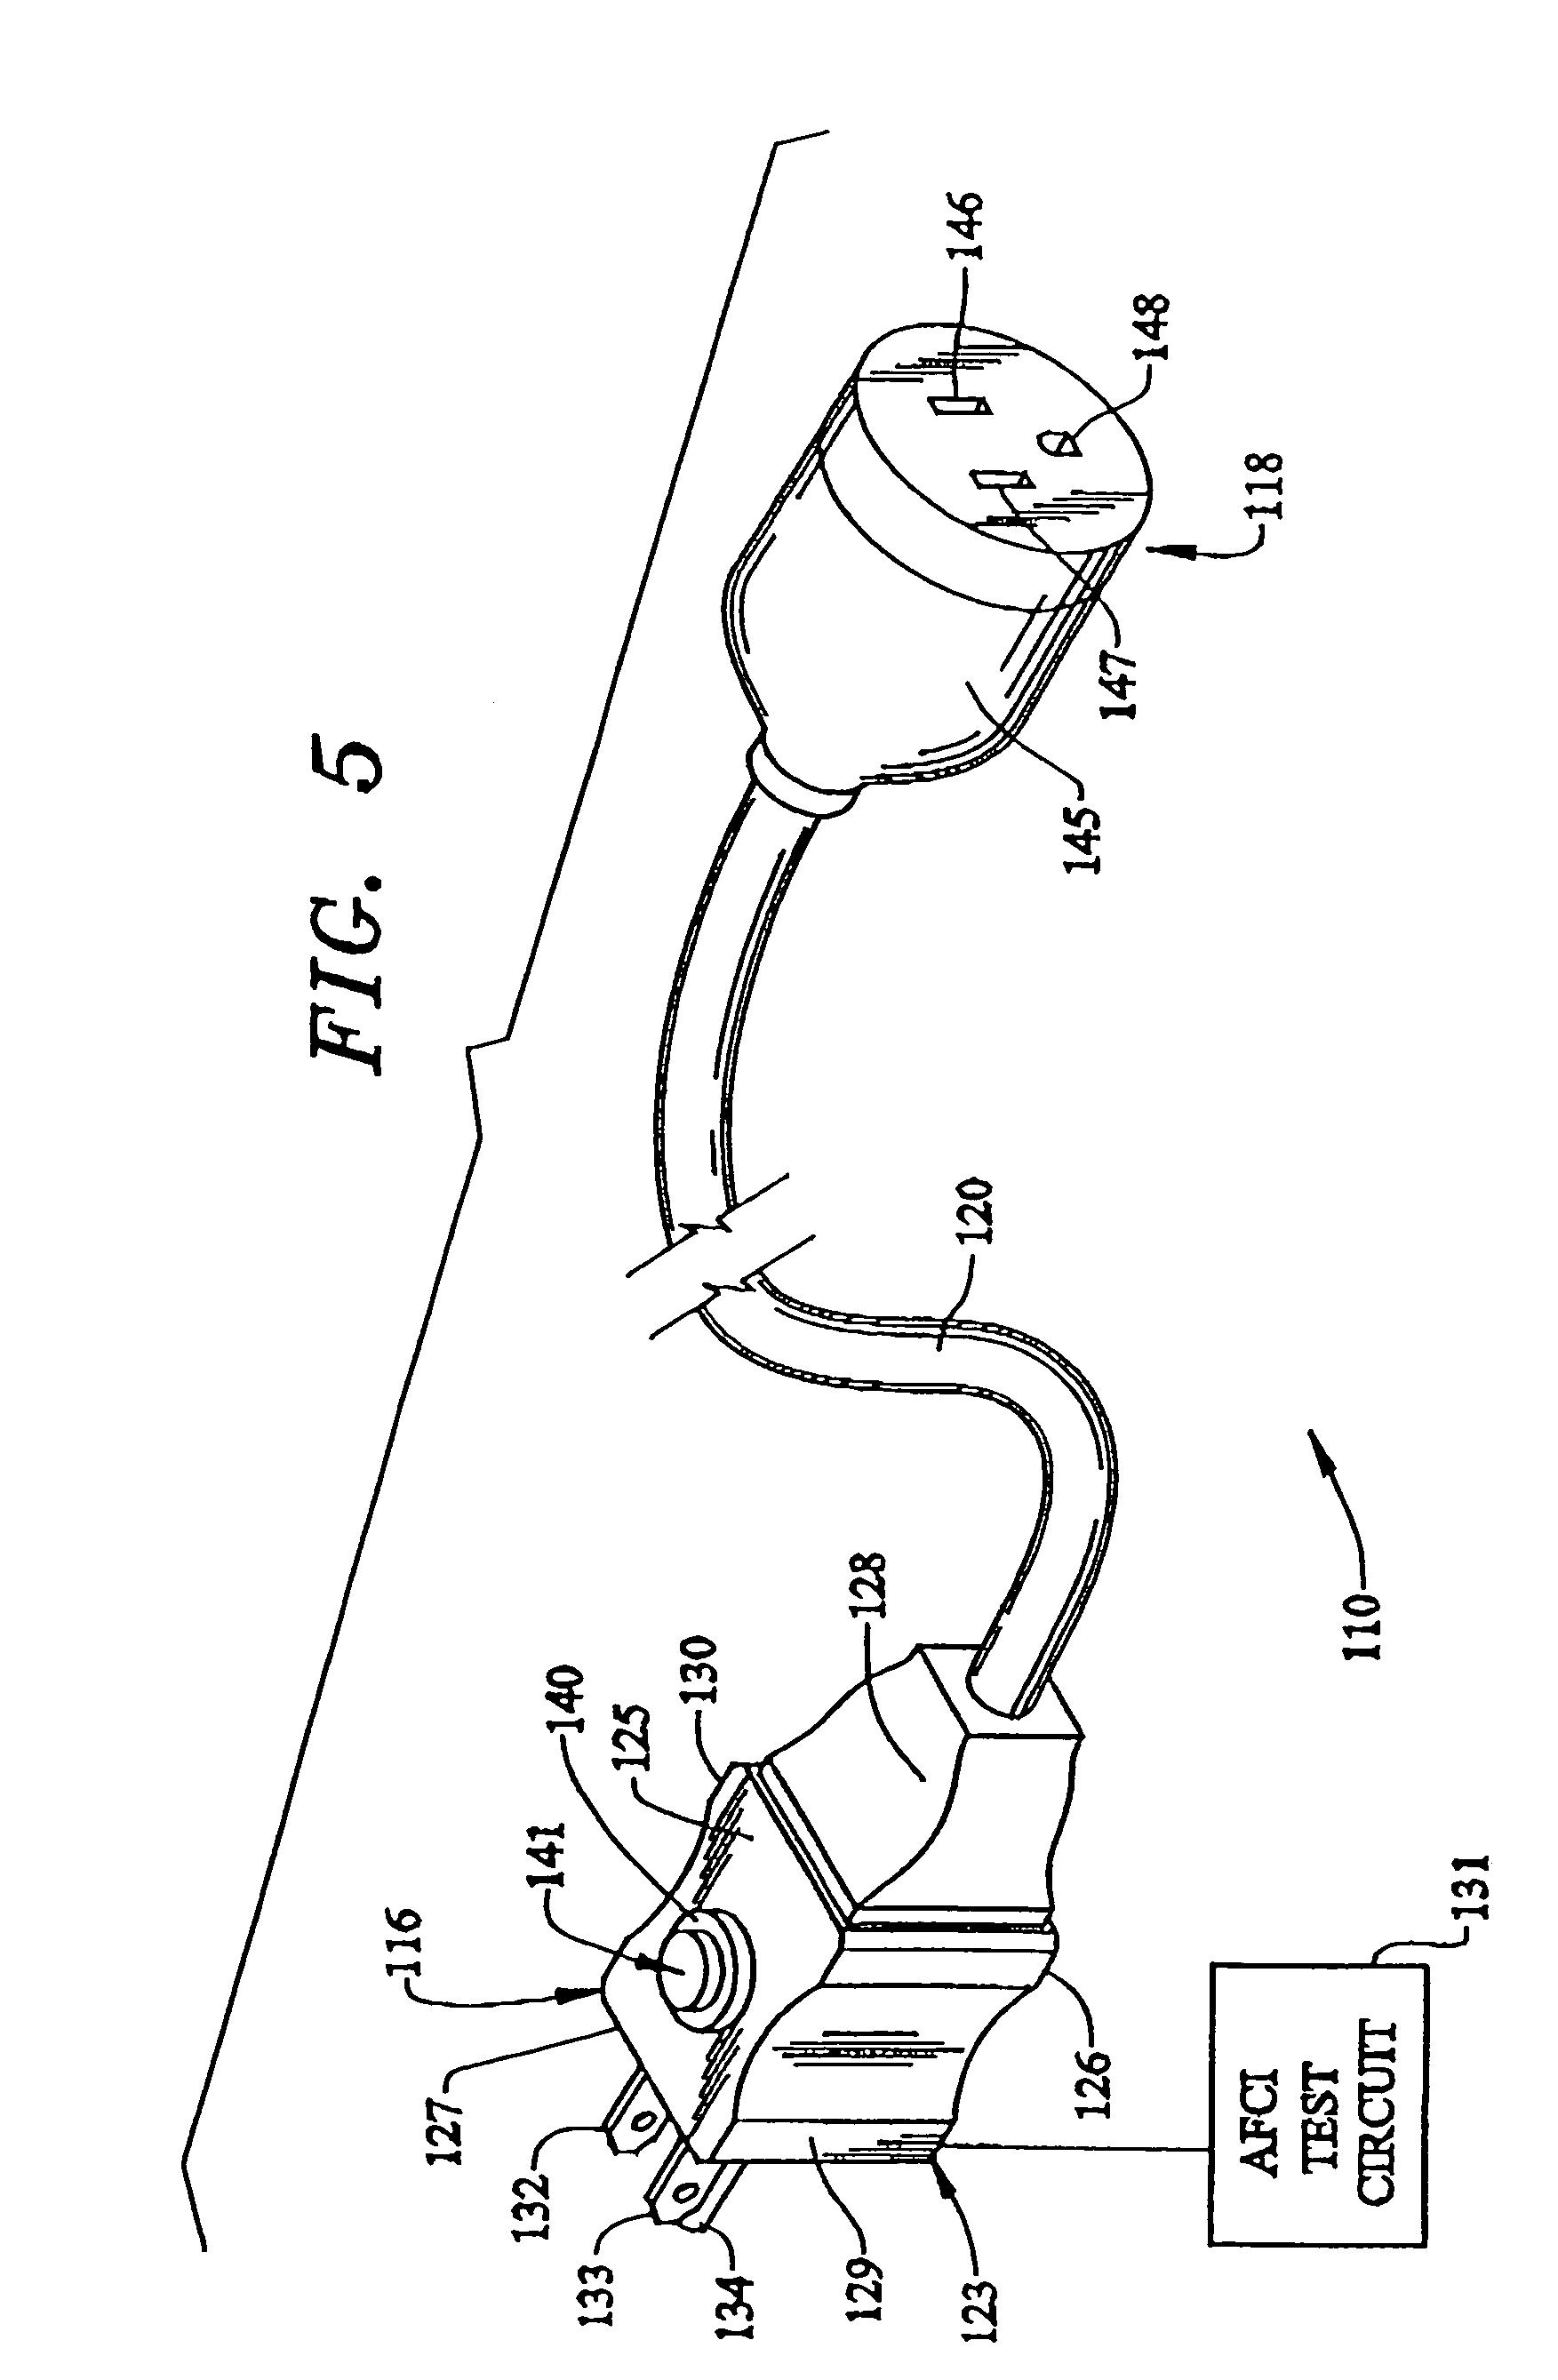 patent us7091723 - afci circuit test module